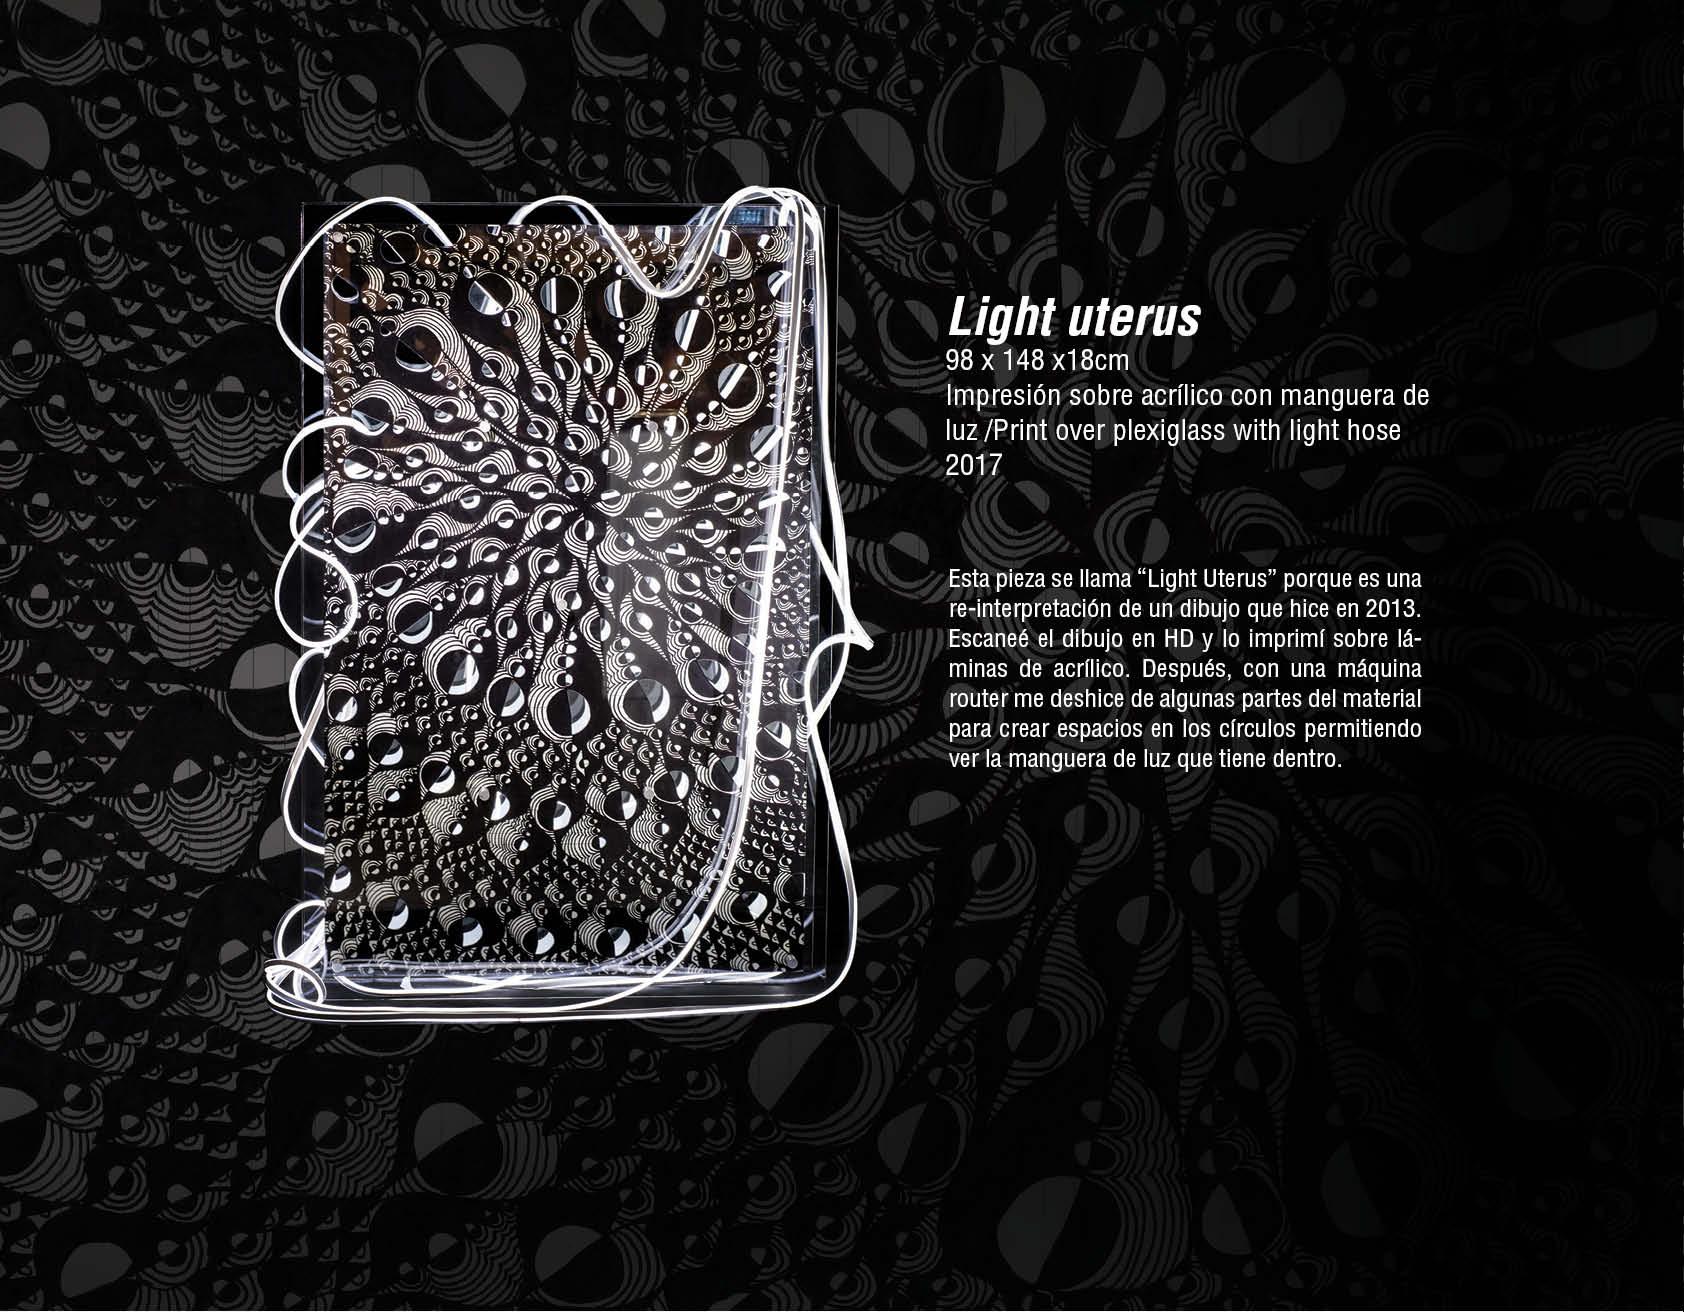 Light uterus 1.jpg